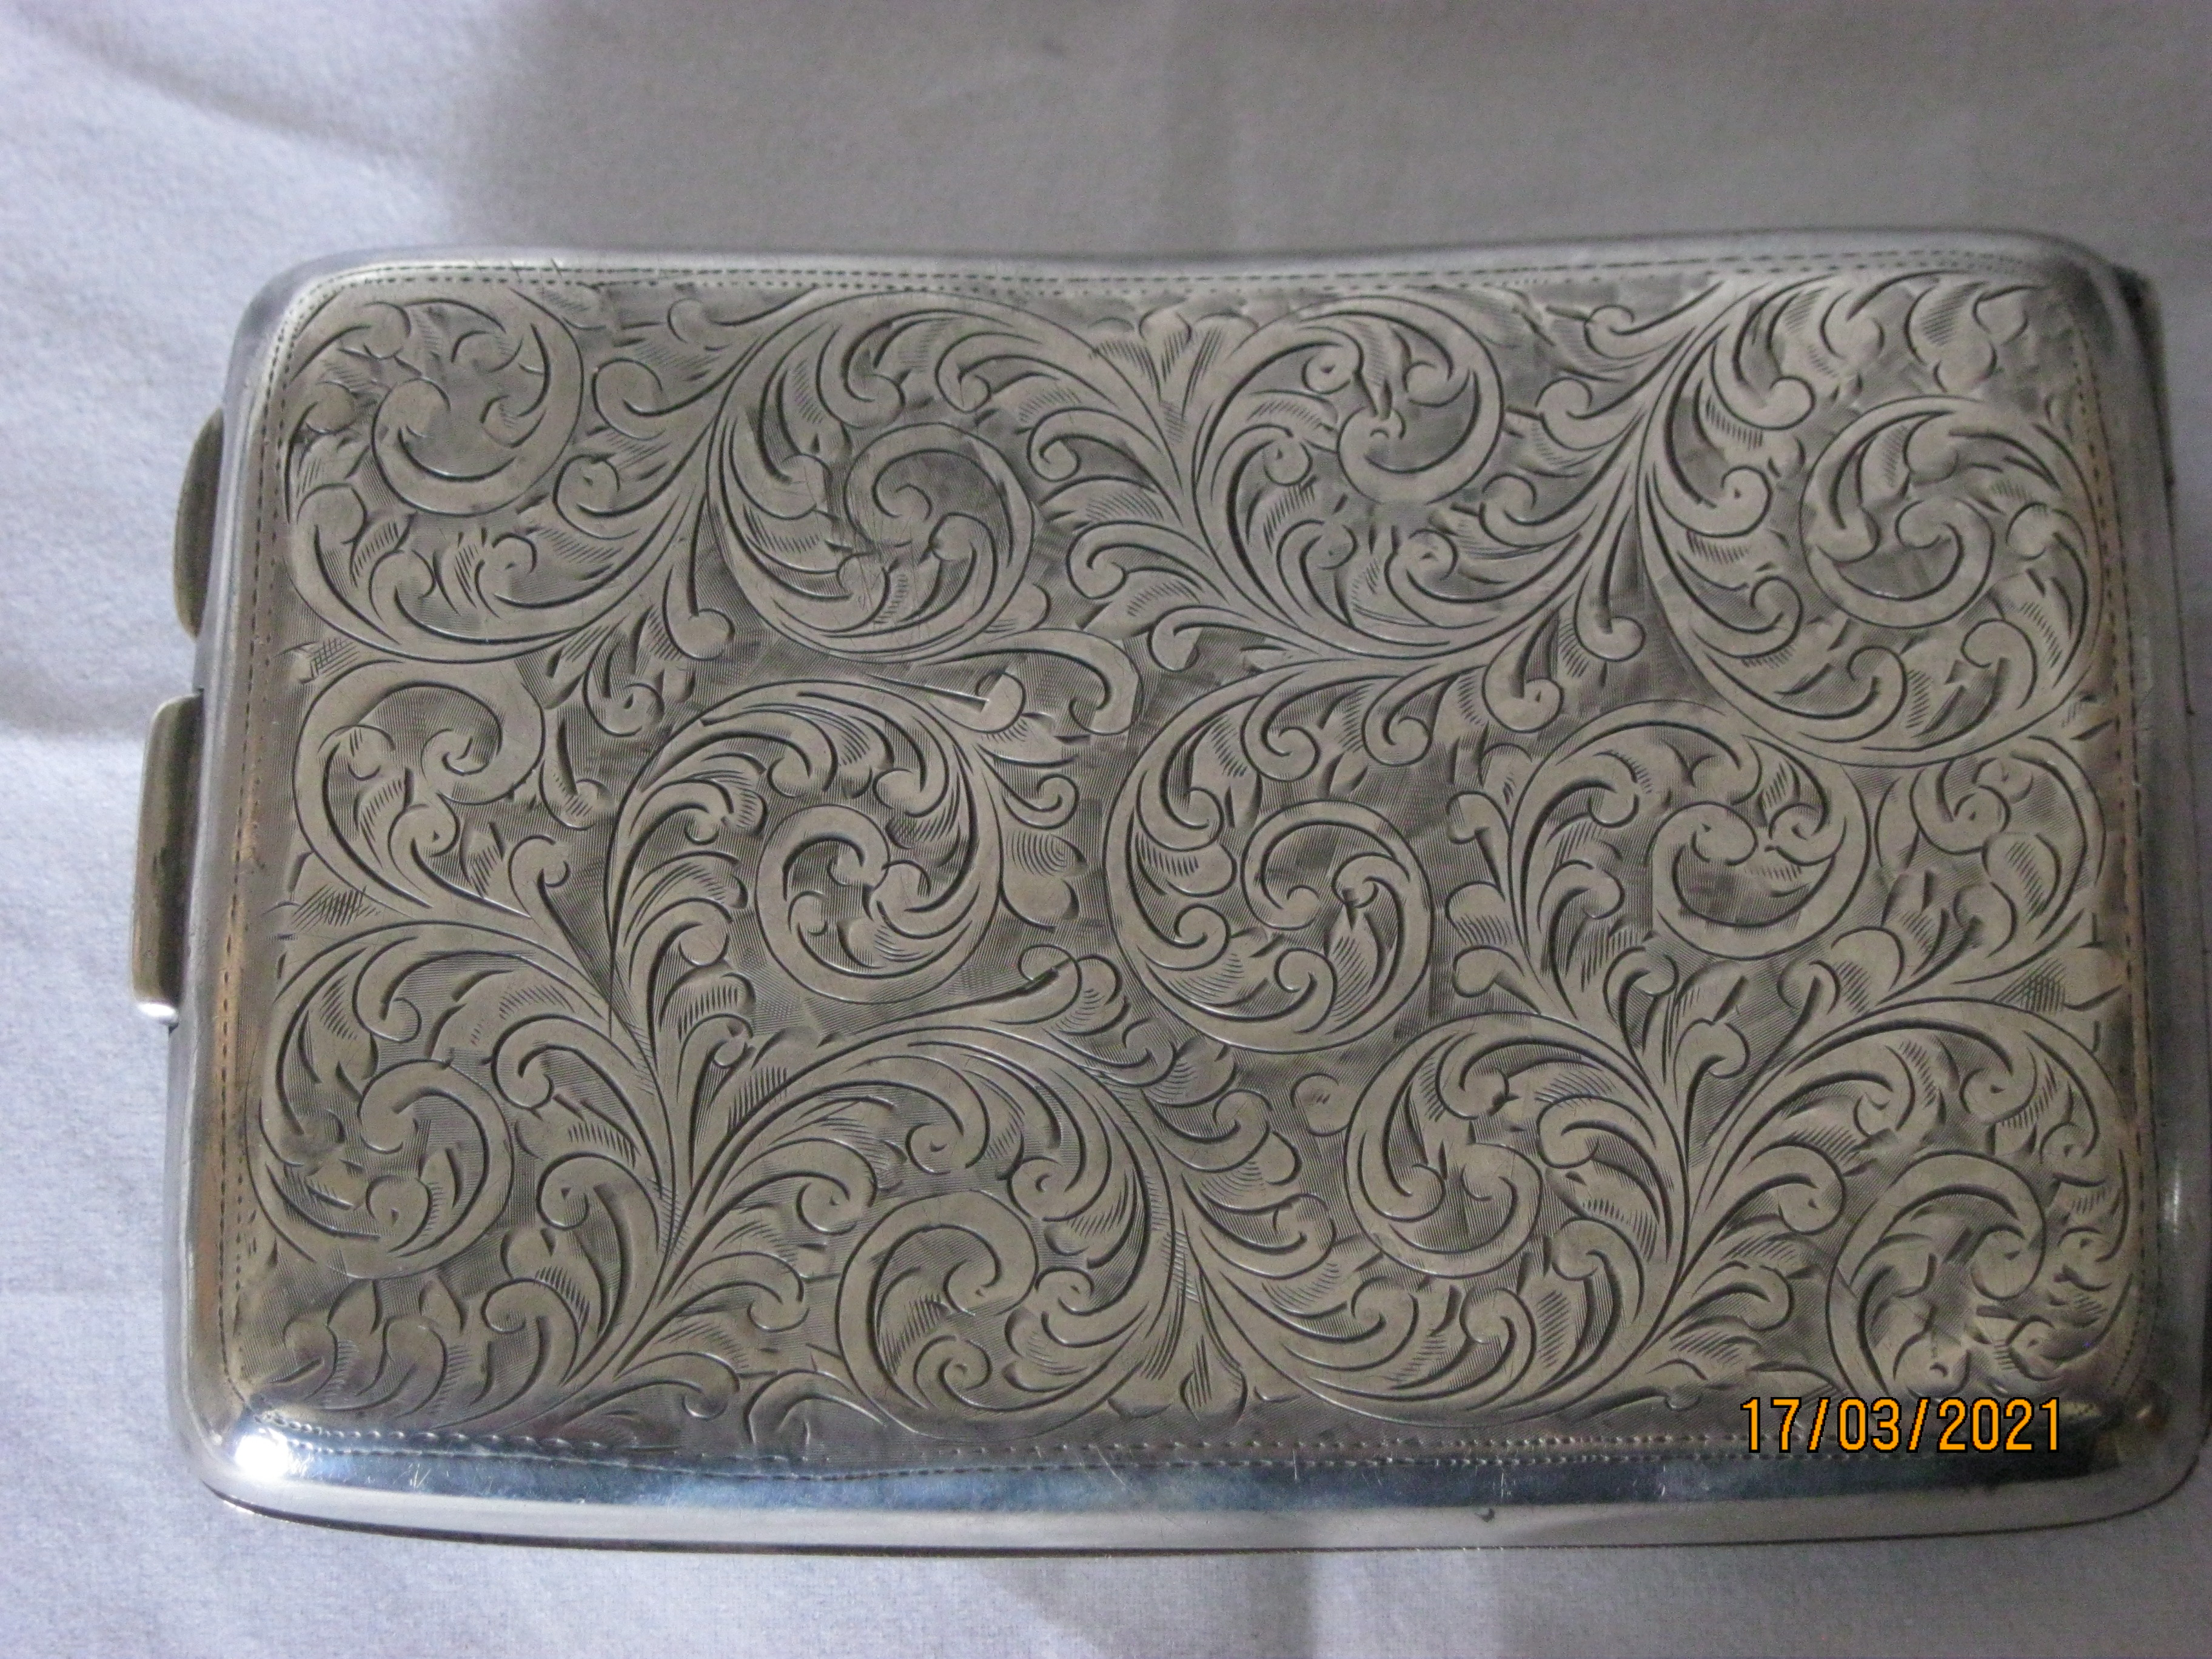 Antique Sterling Silver Cigarette Case 1921 - Image 3 of 11